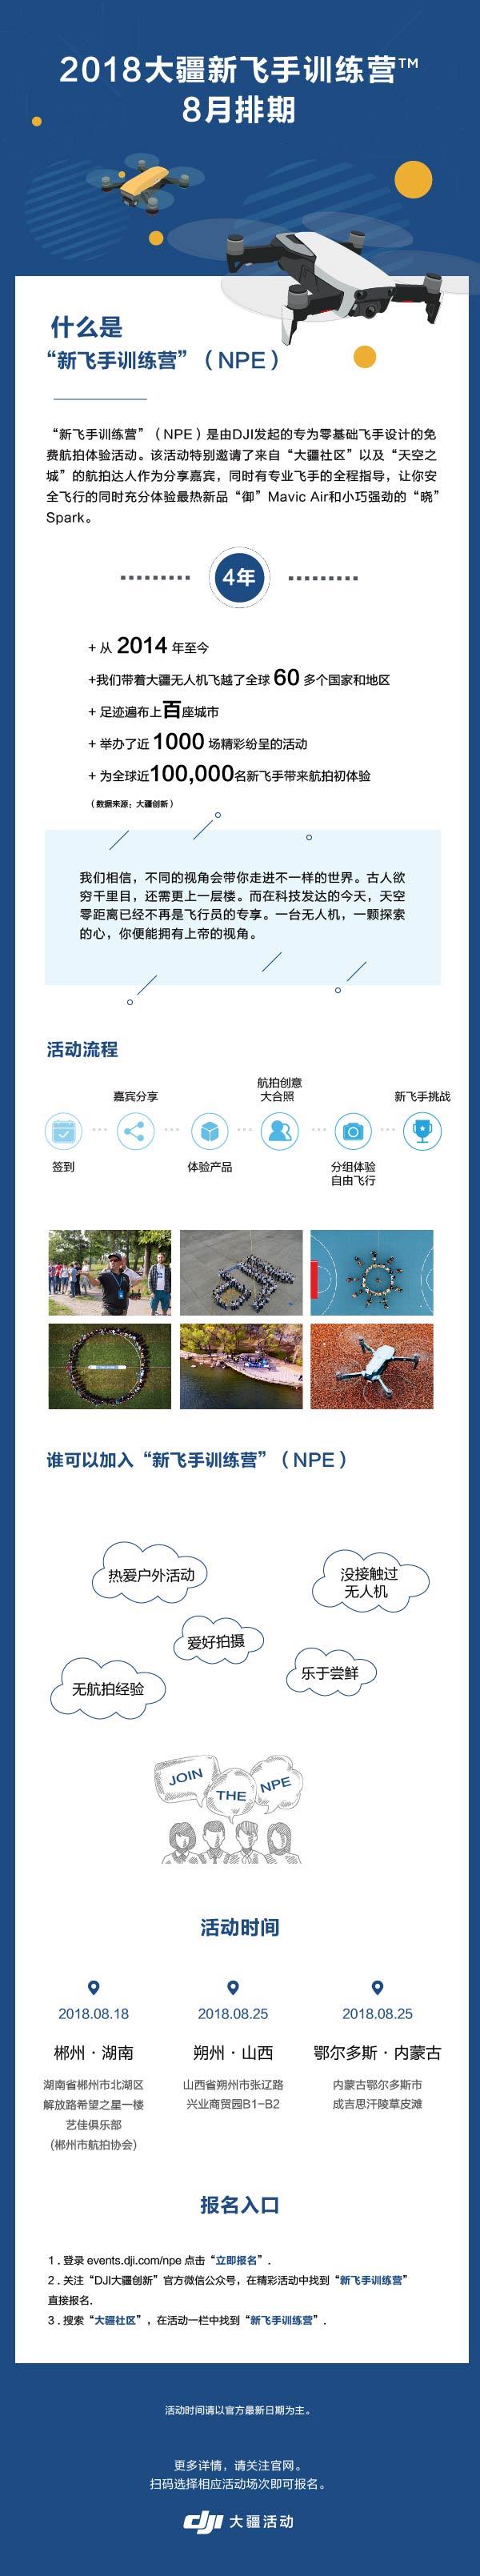 NPE活动宣传页_8月排期_20180803.jpg